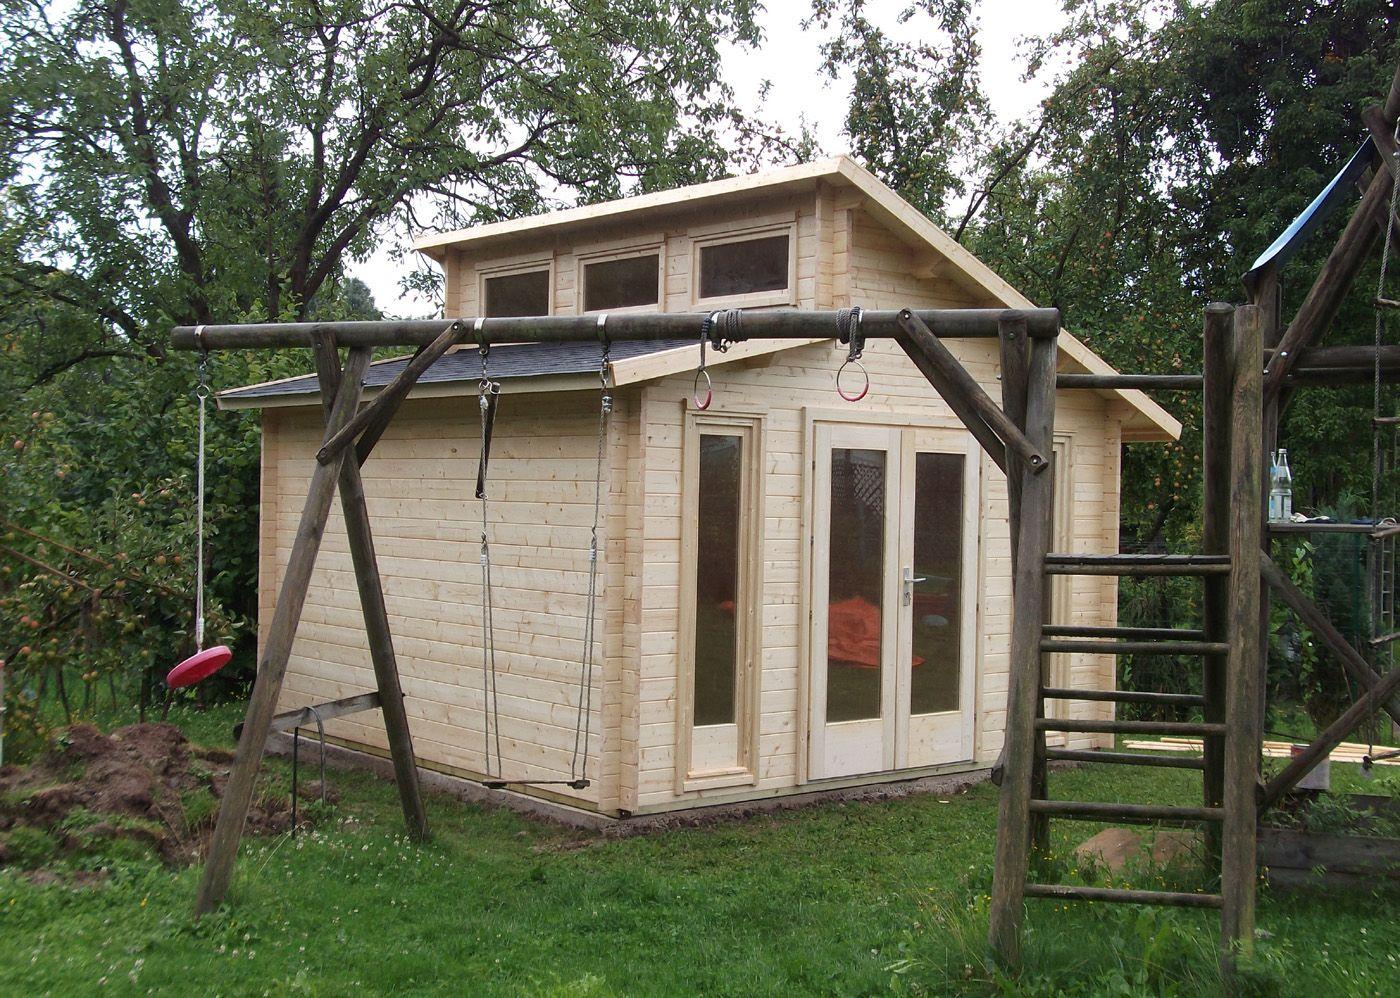 Naturholz Pultdach Gartenhaus im Garten. Auf dem